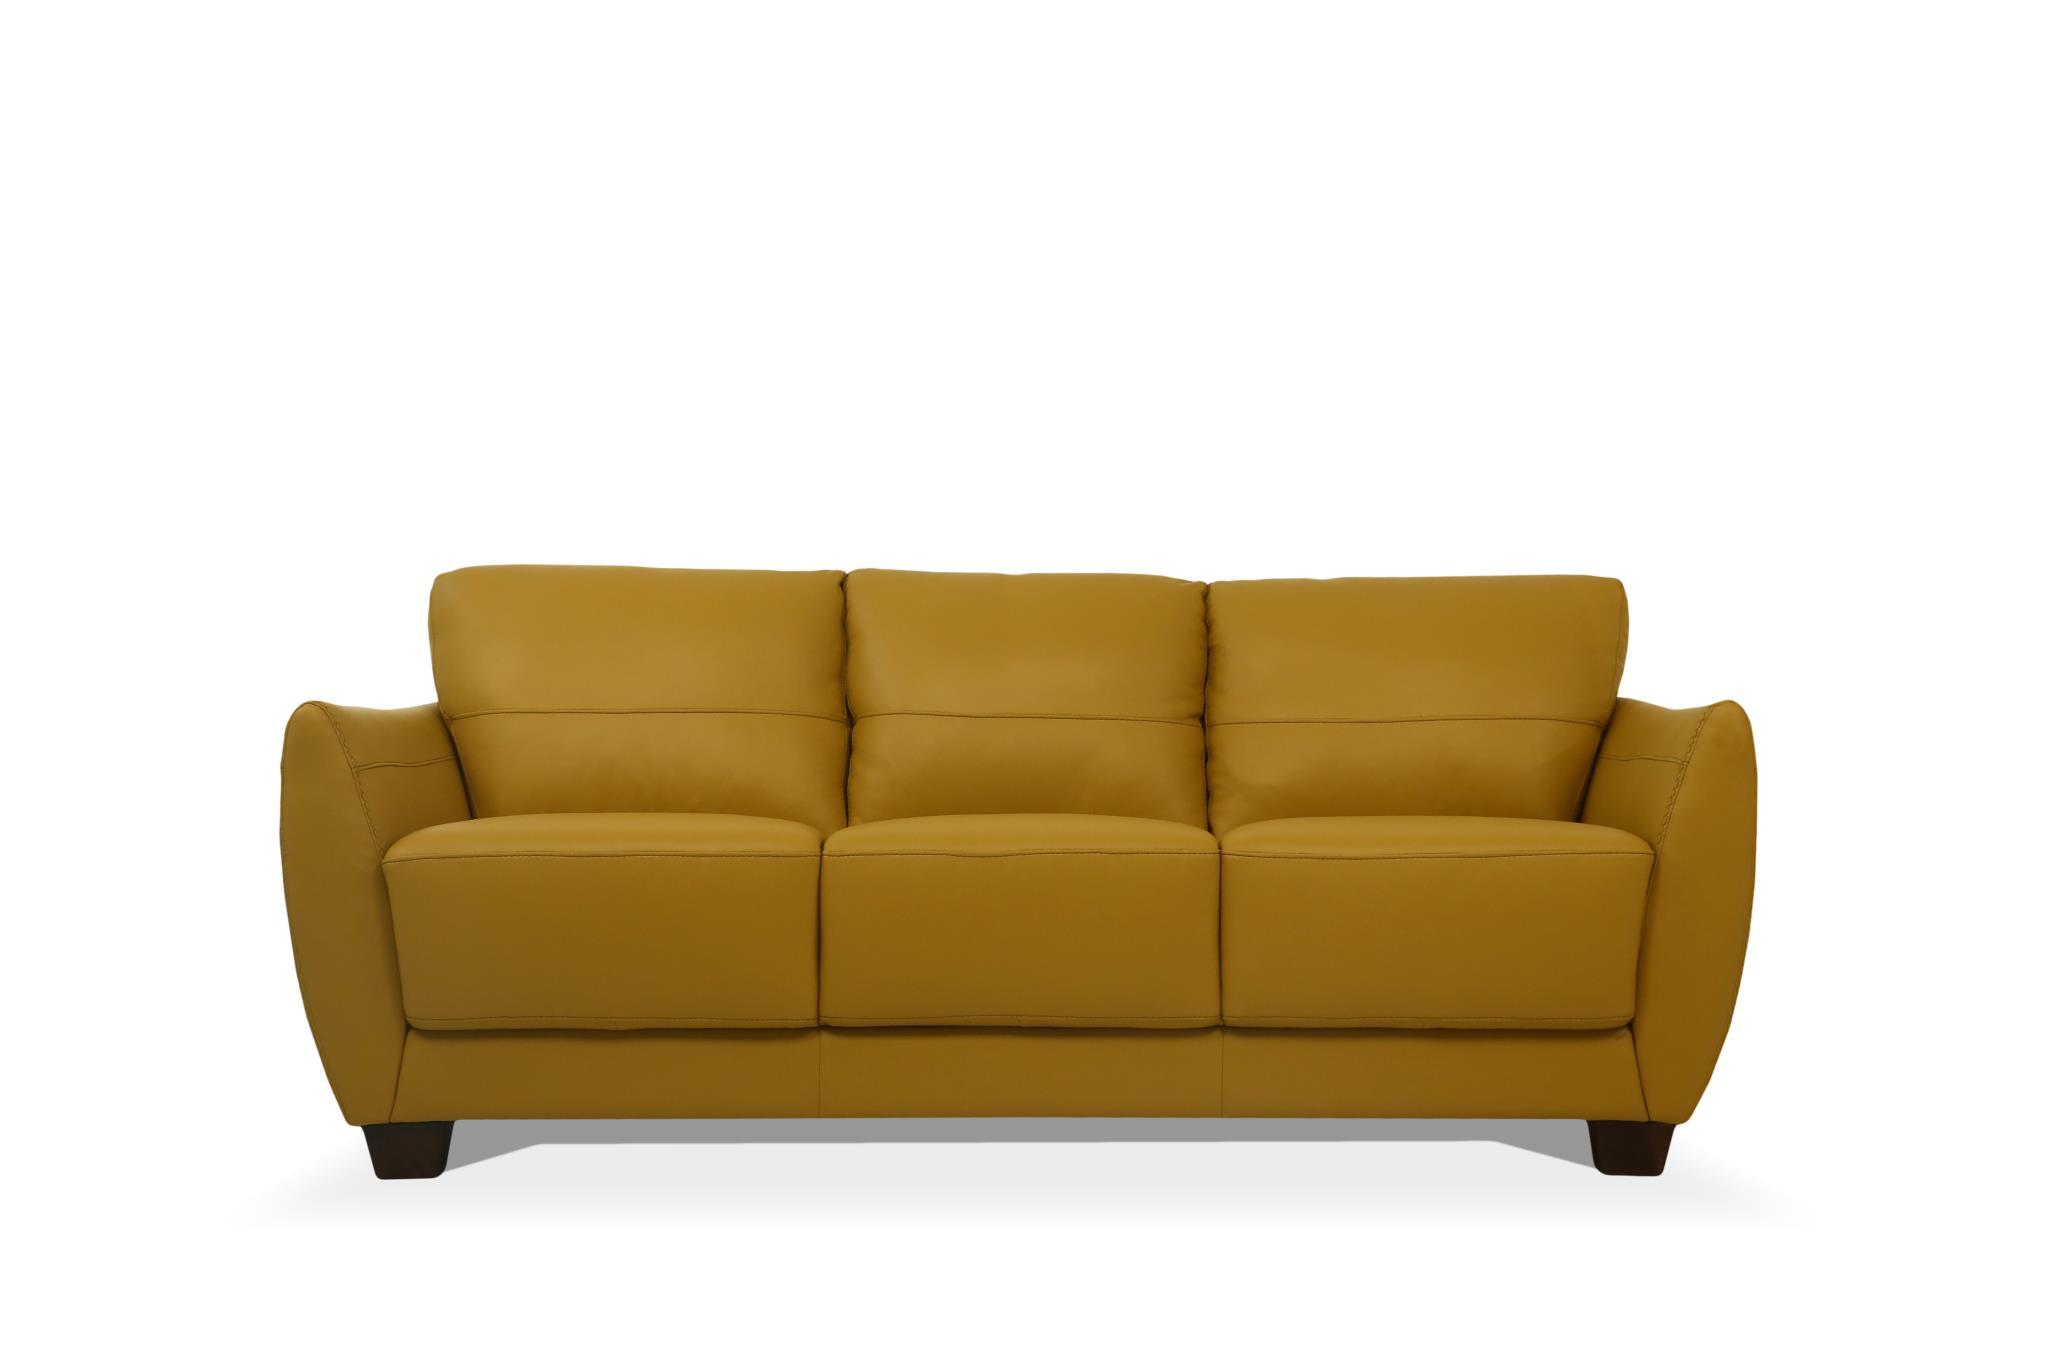 Mustard Sofa Front